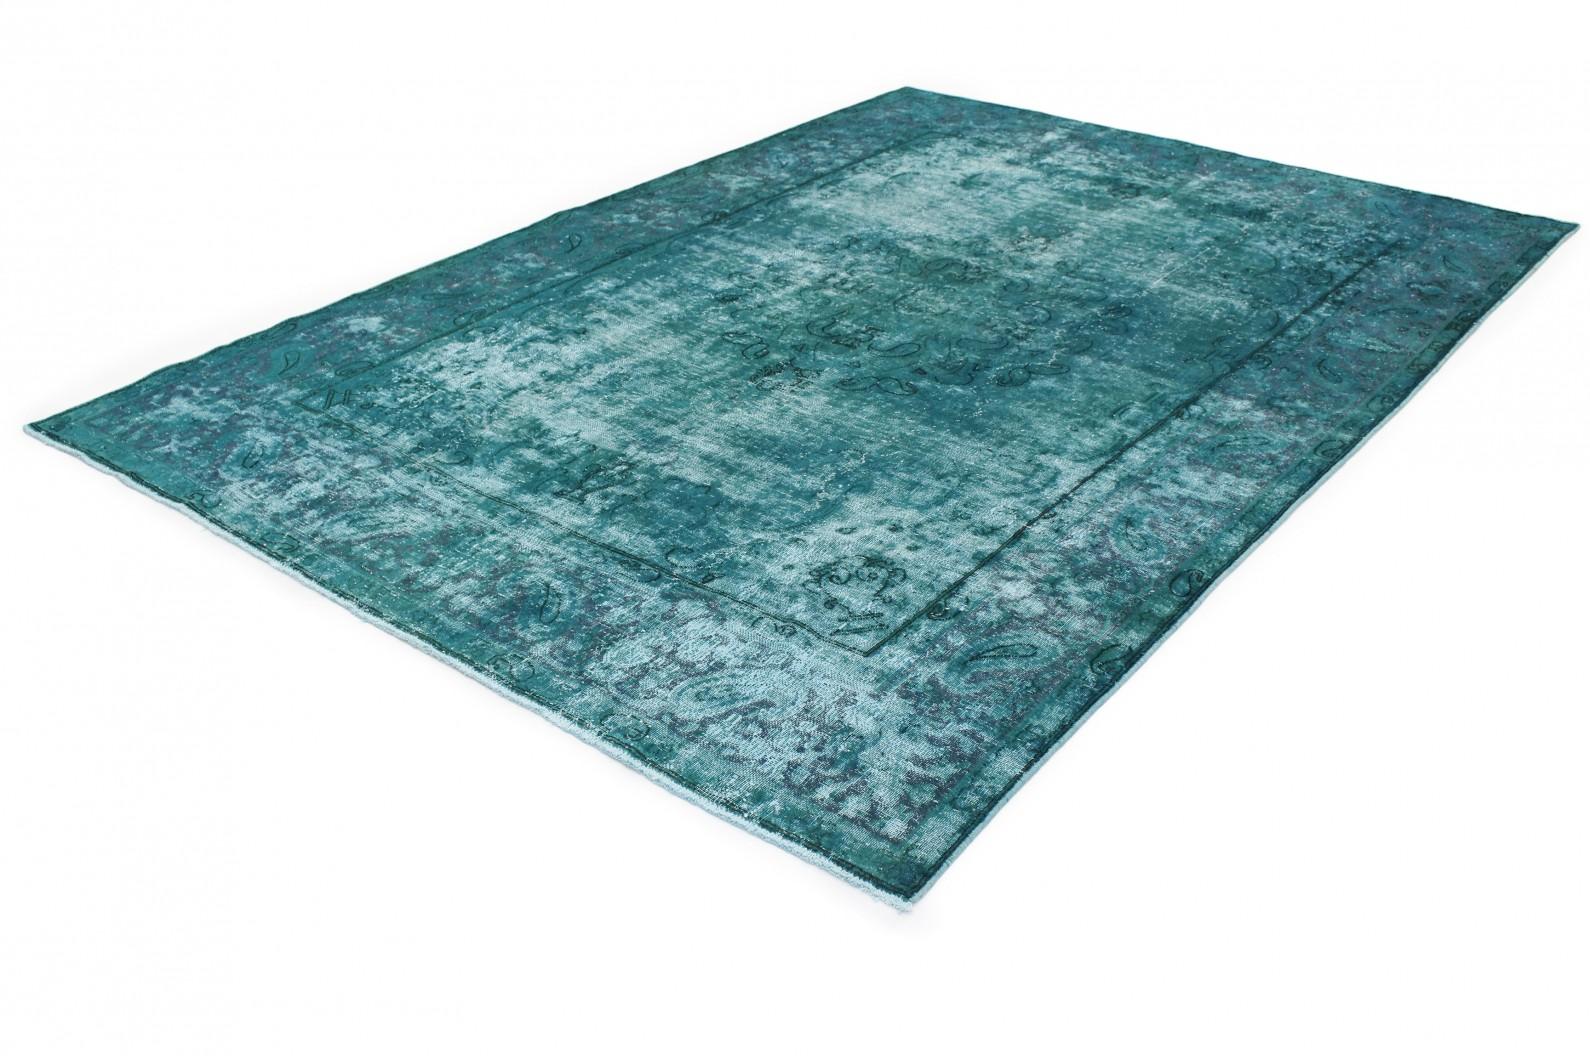 vintage teppich t rkis in 340x240 1001 167234 bei kaufen. Black Bedroom Furniture Sets. Home Design Ideas